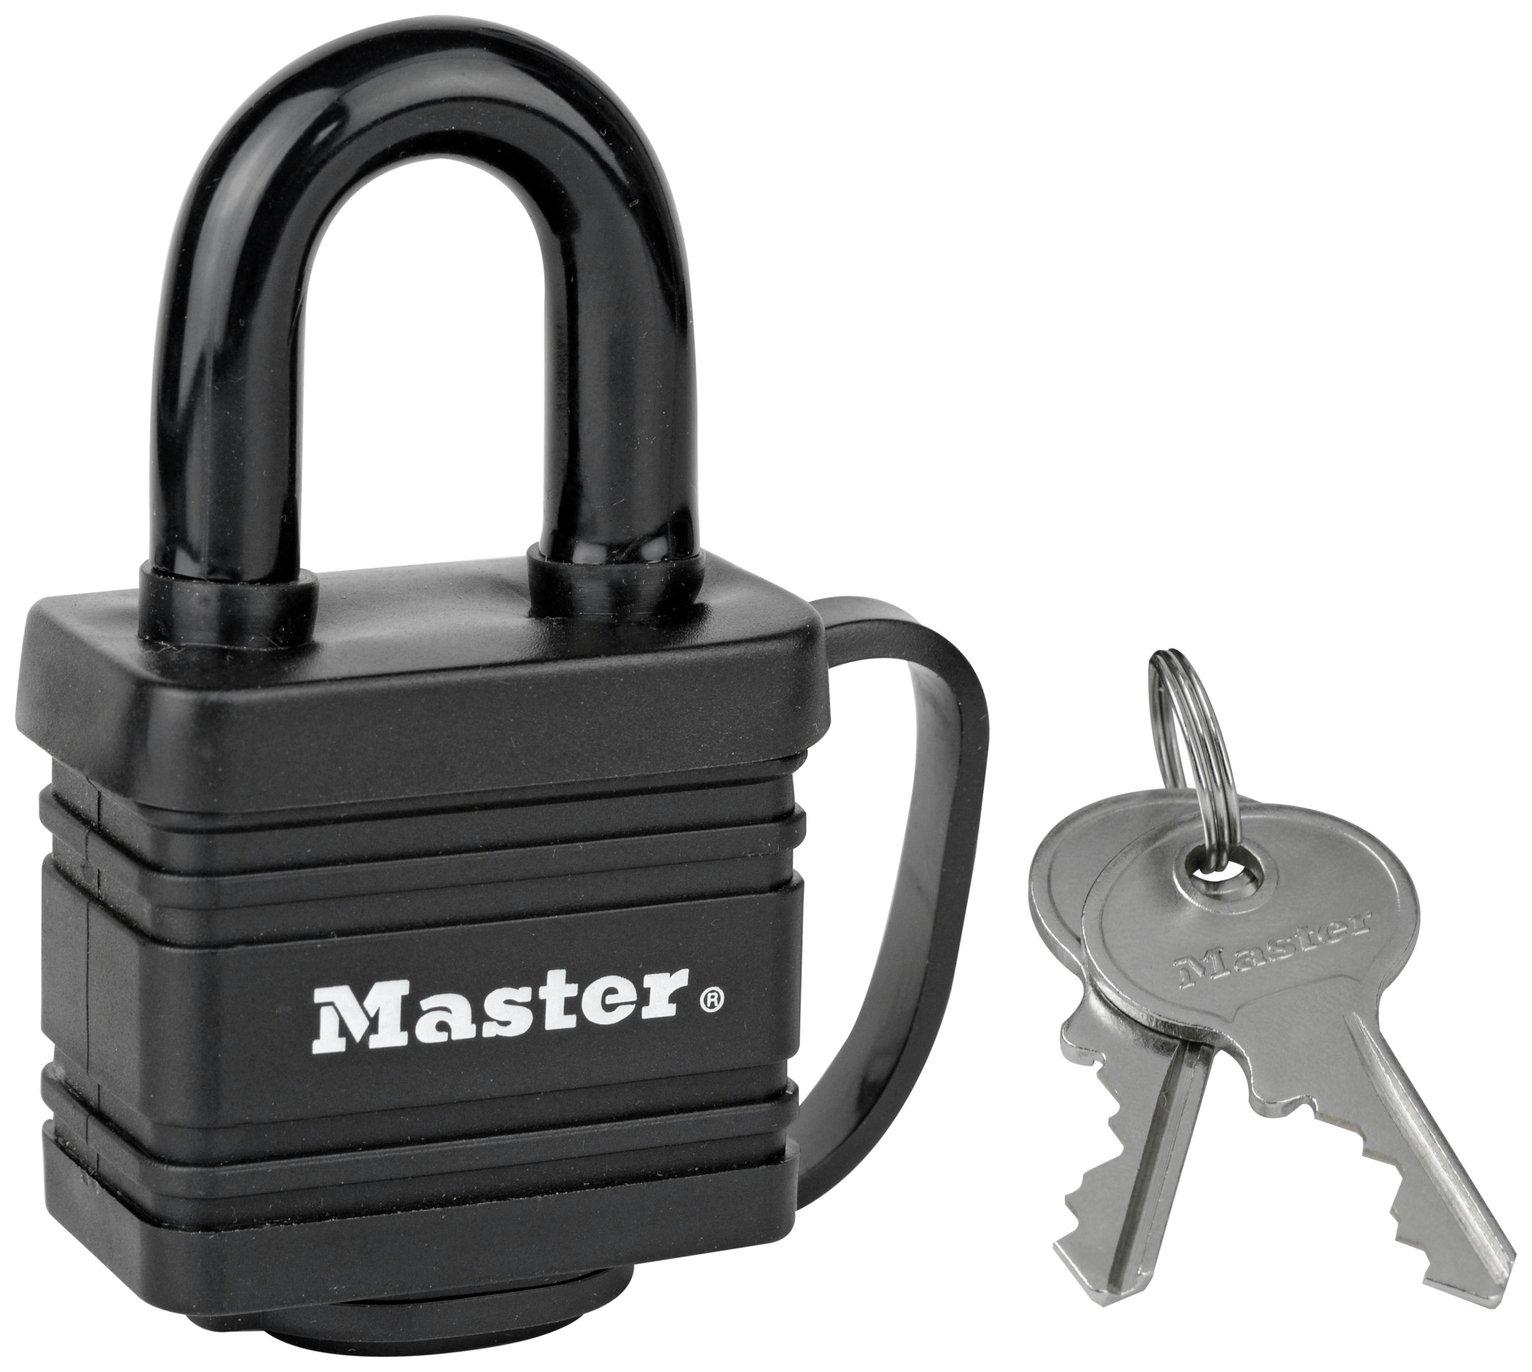 Master Lock Thermoplastic Weatherproof Padlock - £5.00 @ Argos ( free click & collect ) - Limited lifetime guarantee